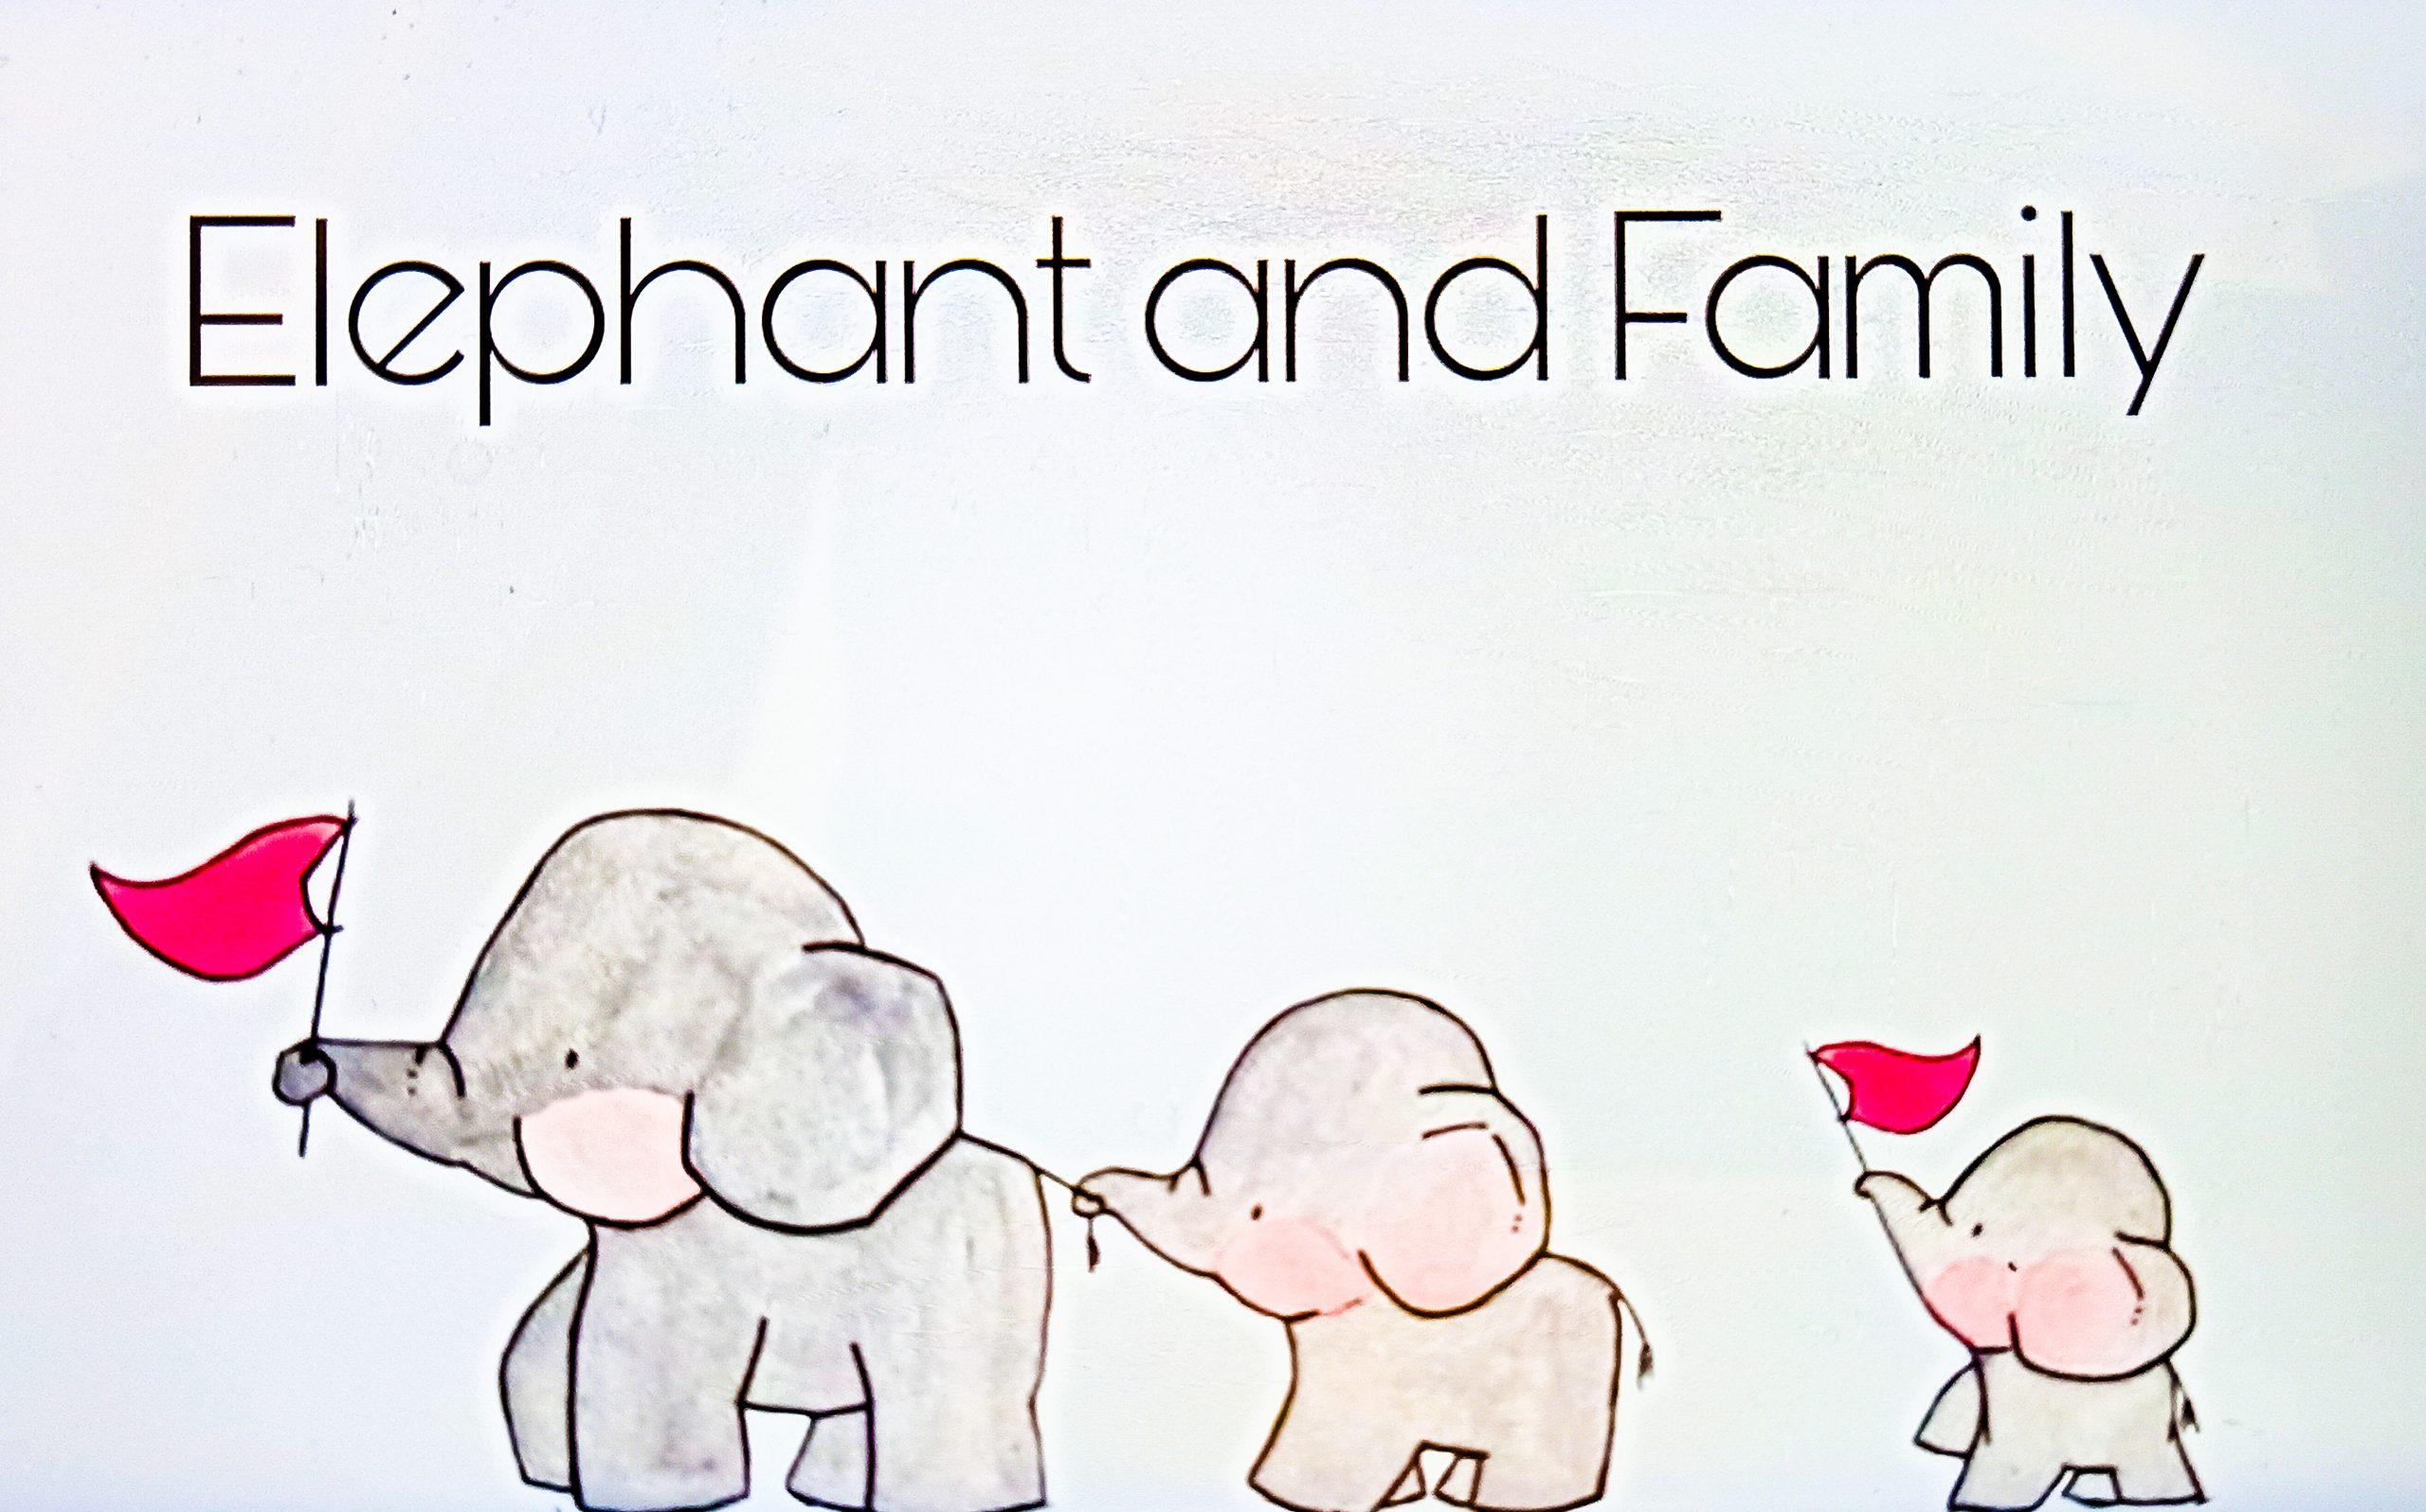 Elephant and Family